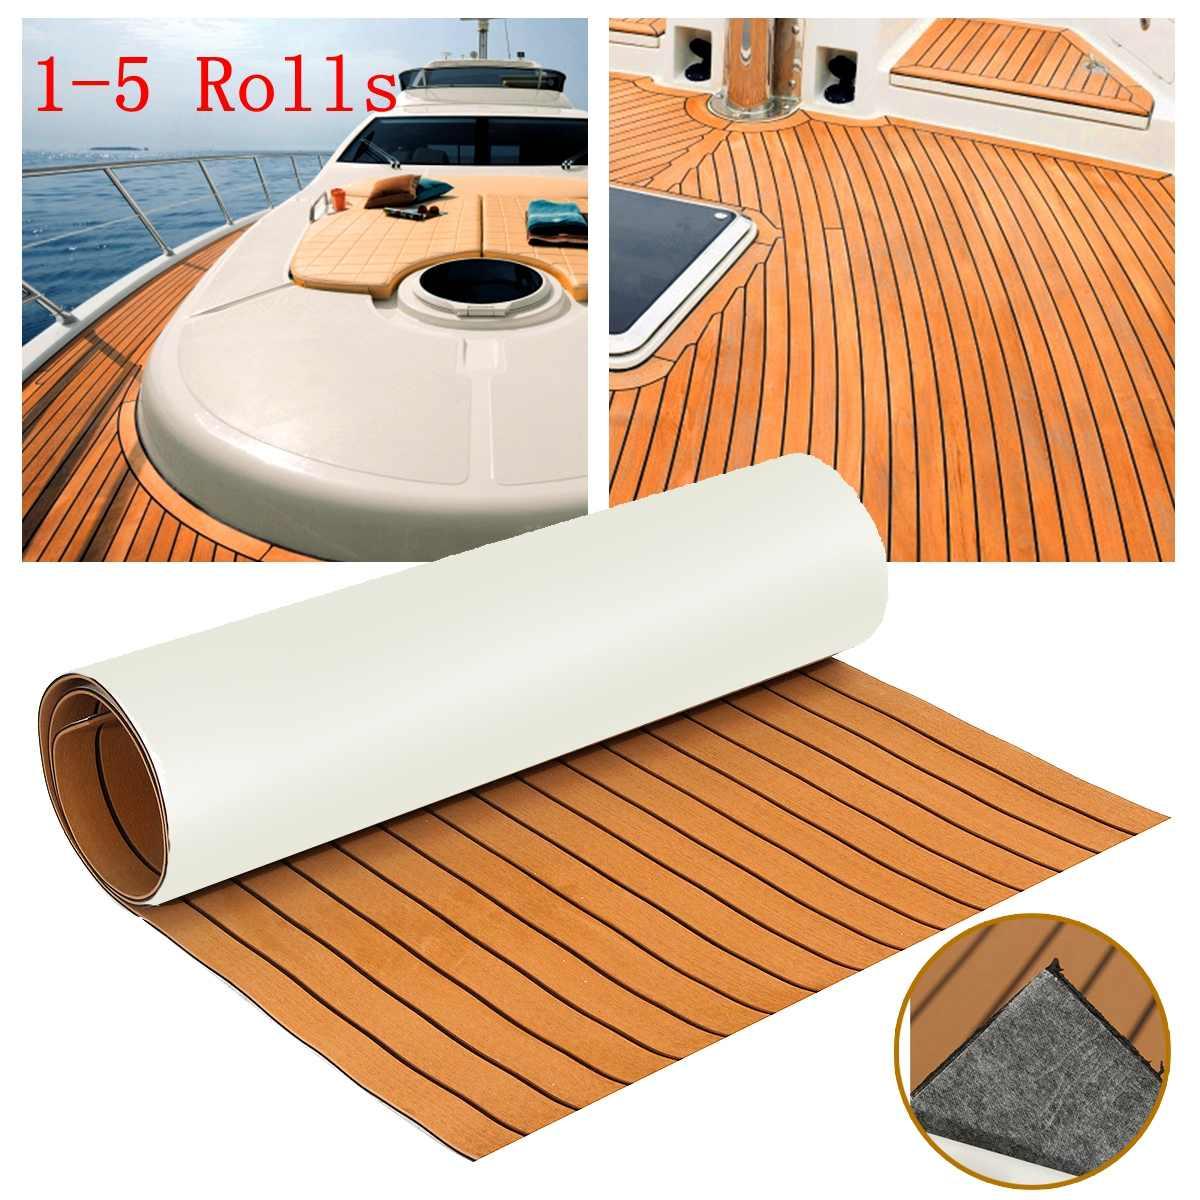 6mm 89x230cm Self-Adhesive EVA Foam Teak Decking EVA Teak Sheet Marine Flooring Faux Boat Decking Sheet Brown Black Line